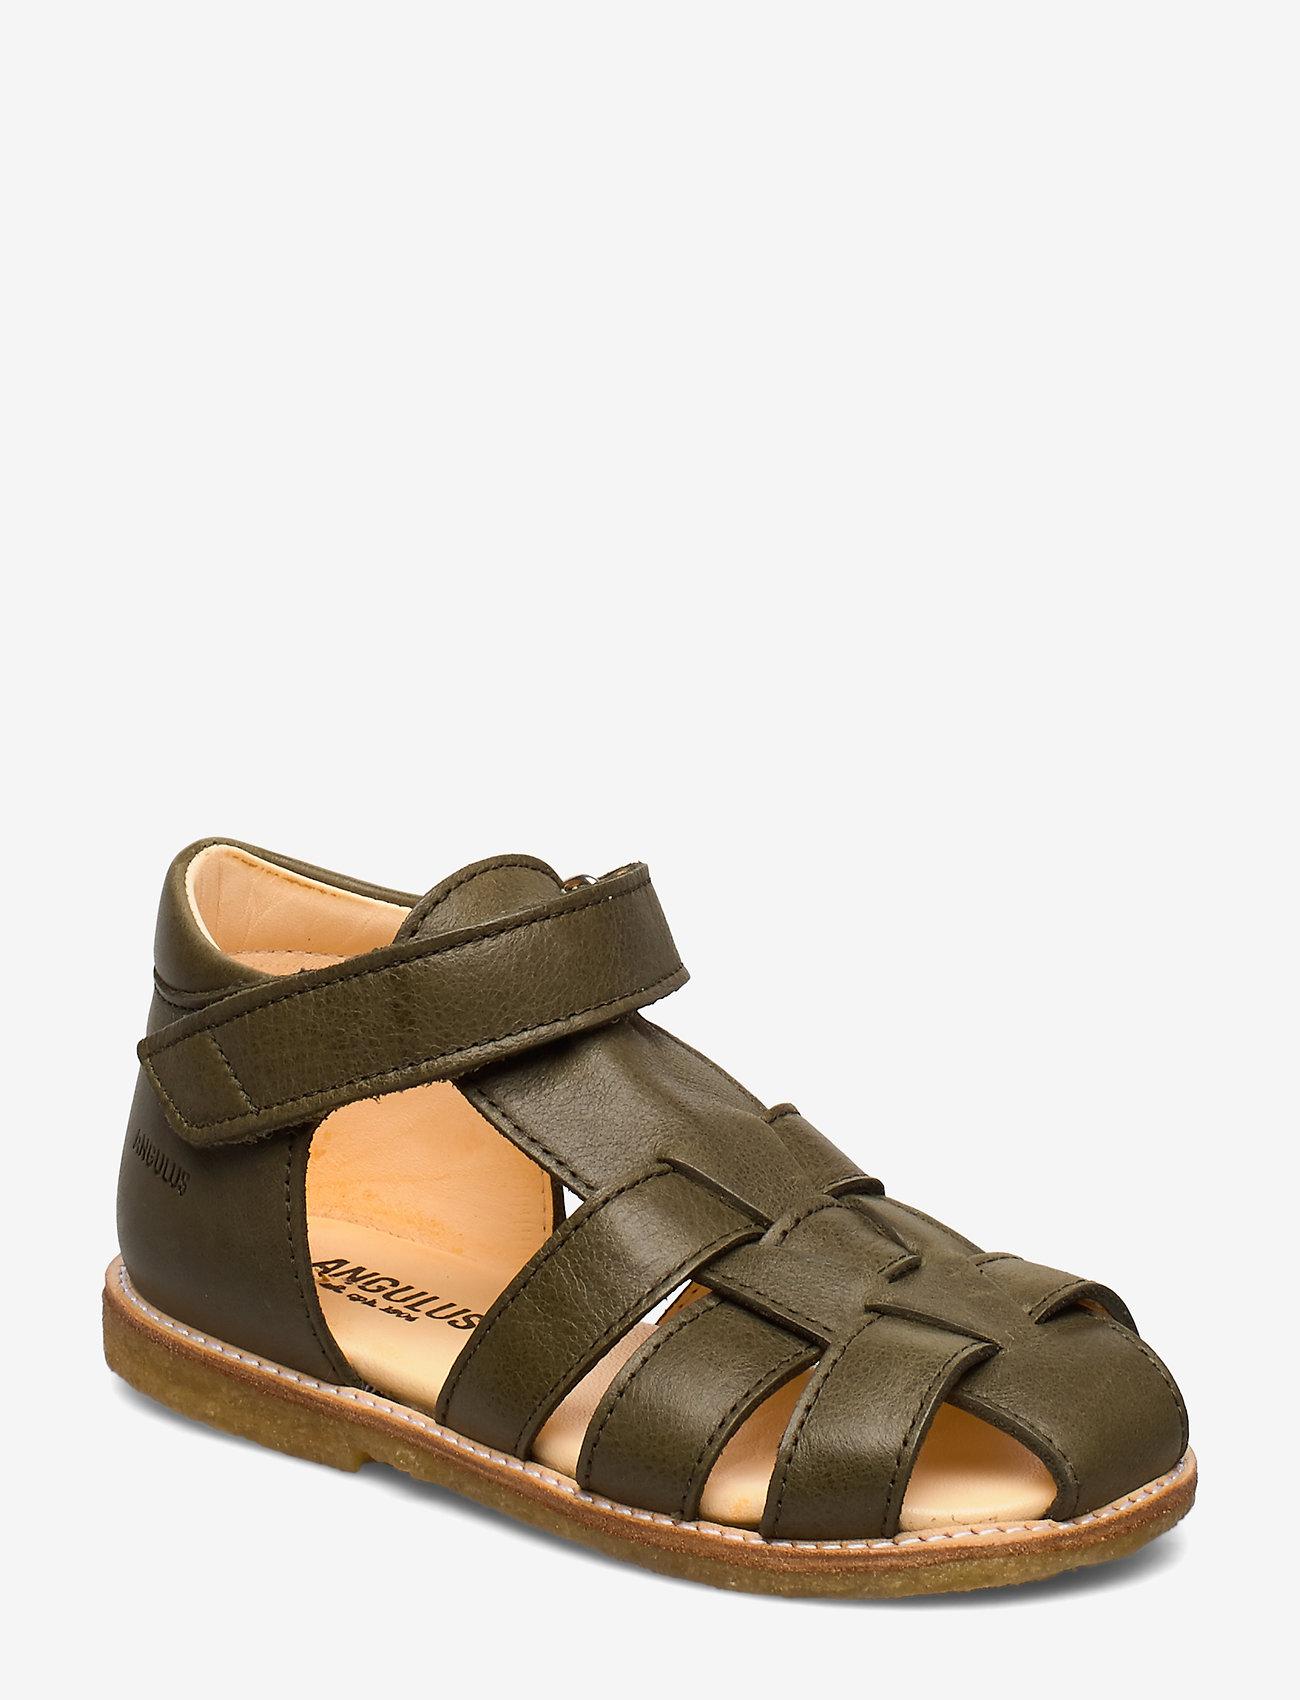 ANGULUS - Baby sandal - sandals - 2638 khaki - 0